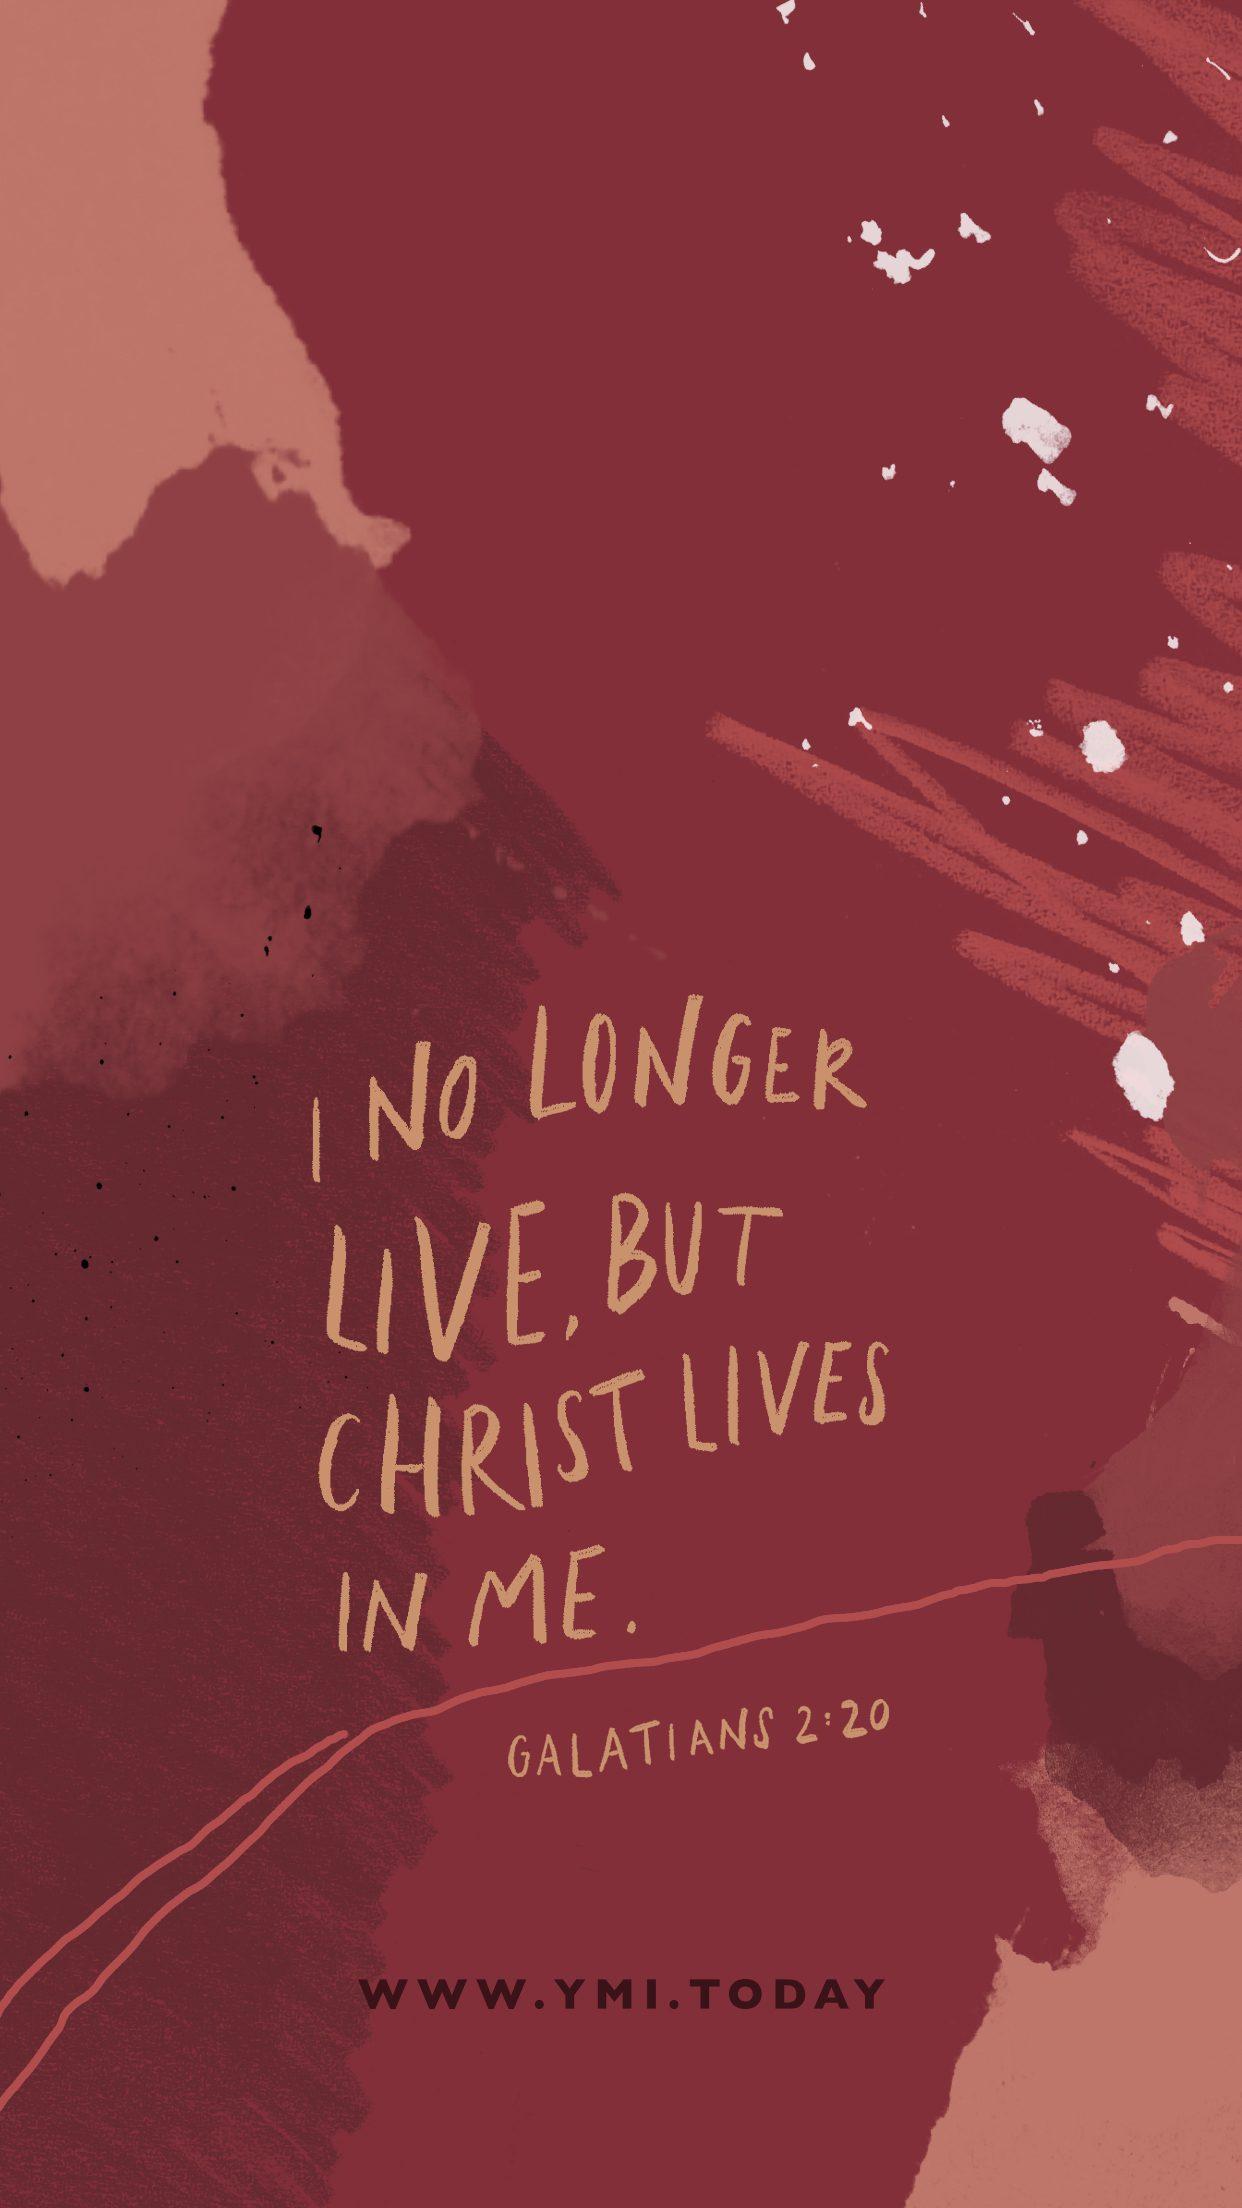 YMI February 2020 Phone Lockscreen - I no longer live, but Christ lives in me. - Galatians 2:20